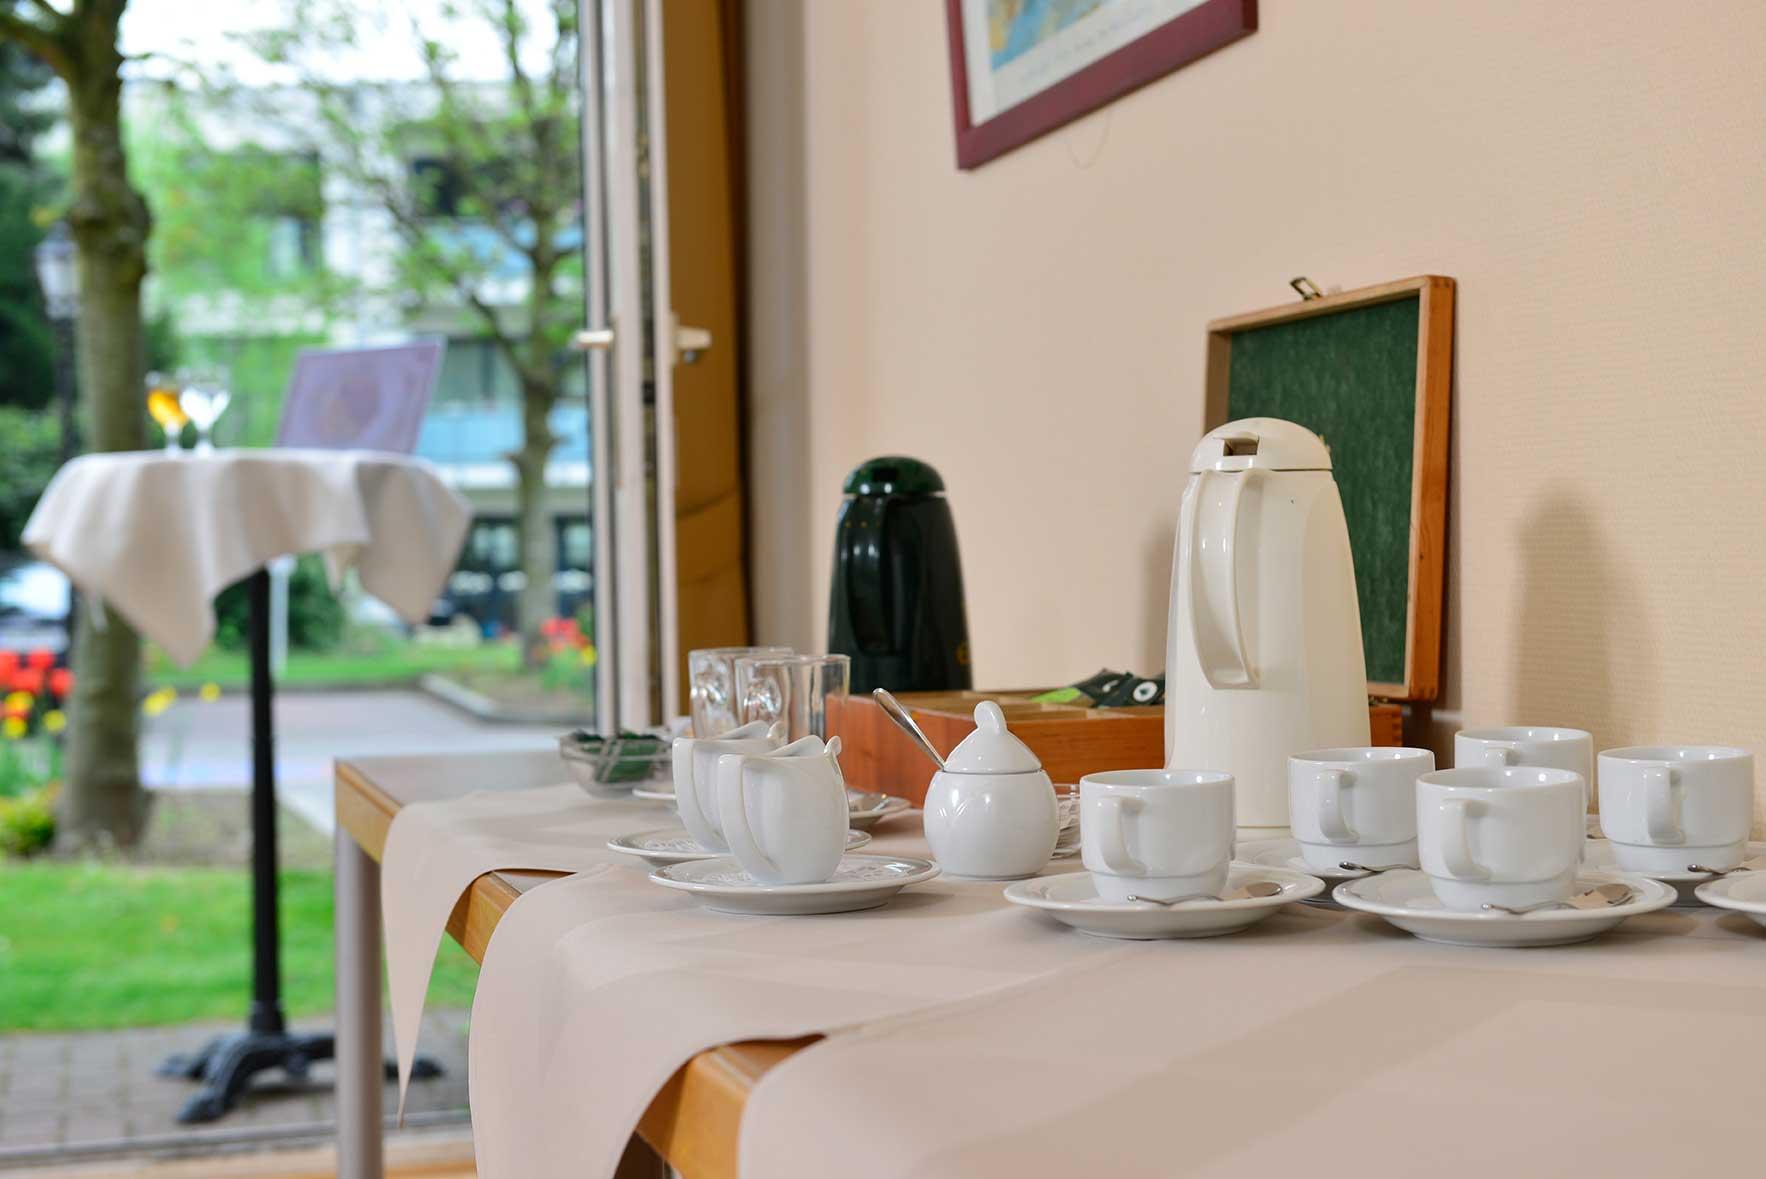 Kaffeepause im Raum Bonn mit Blick zum Hof